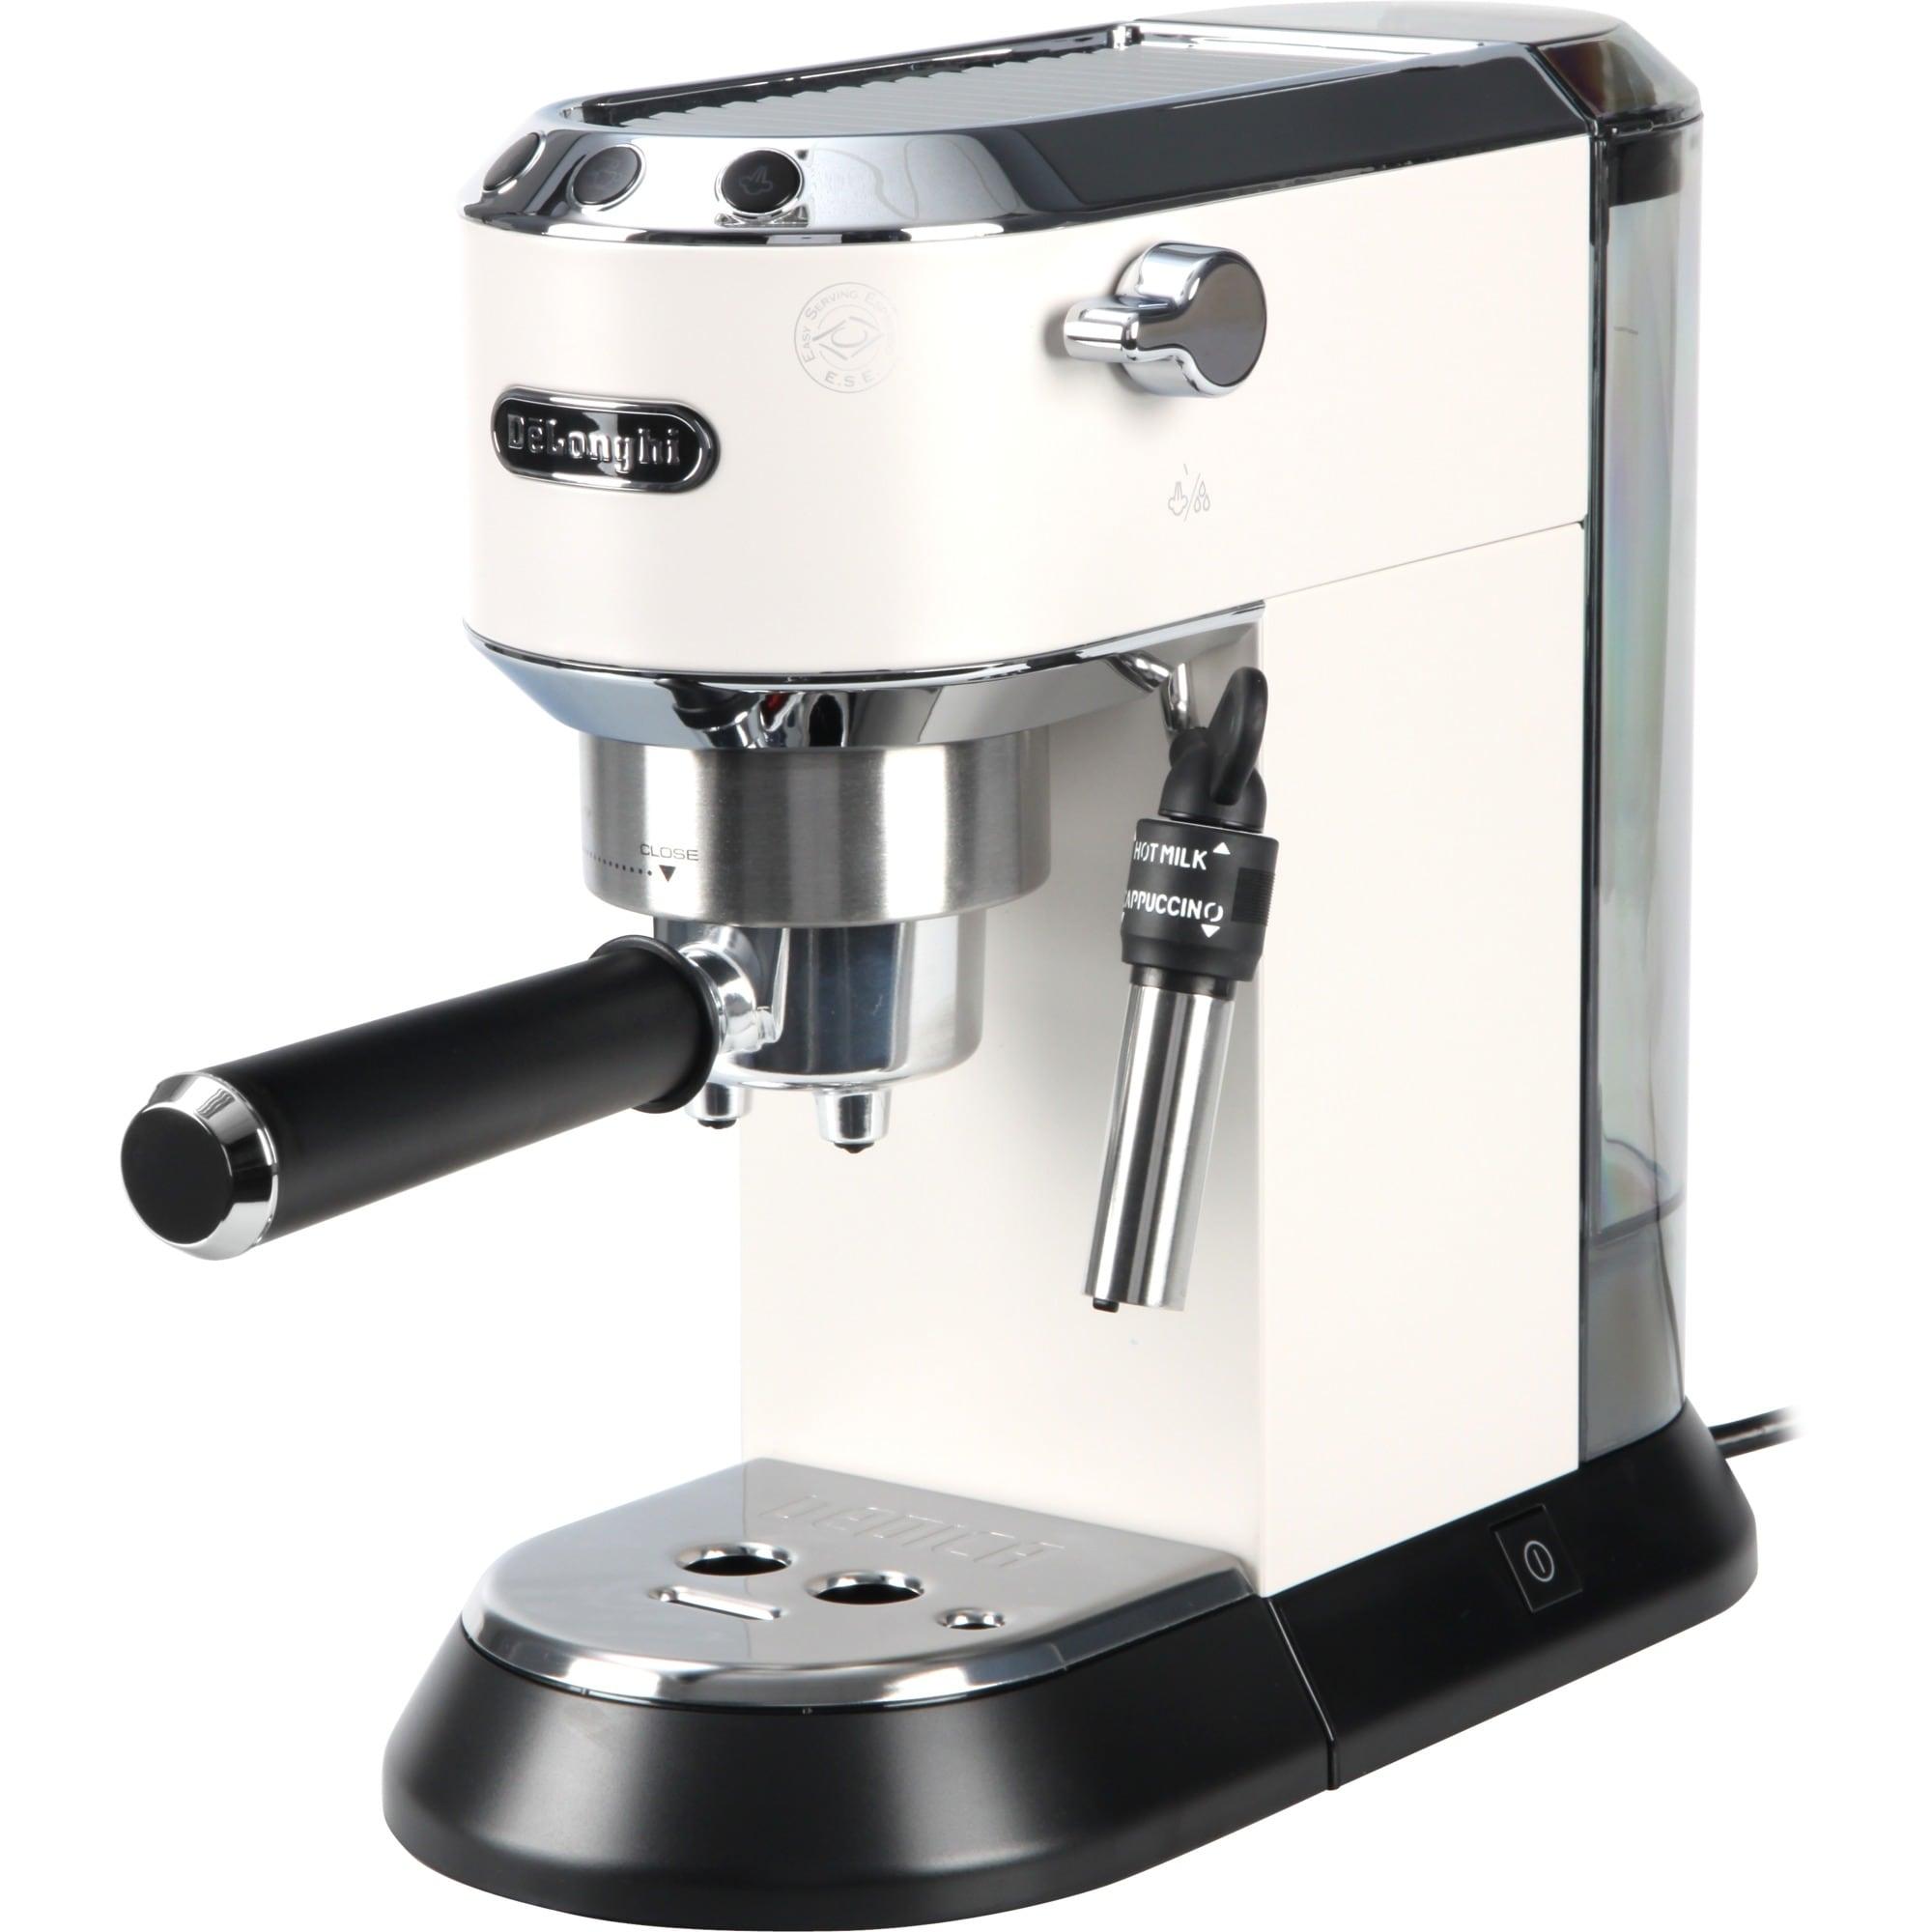 DeLonghi Espressomaschine Dedica Style EC 685.W weiß